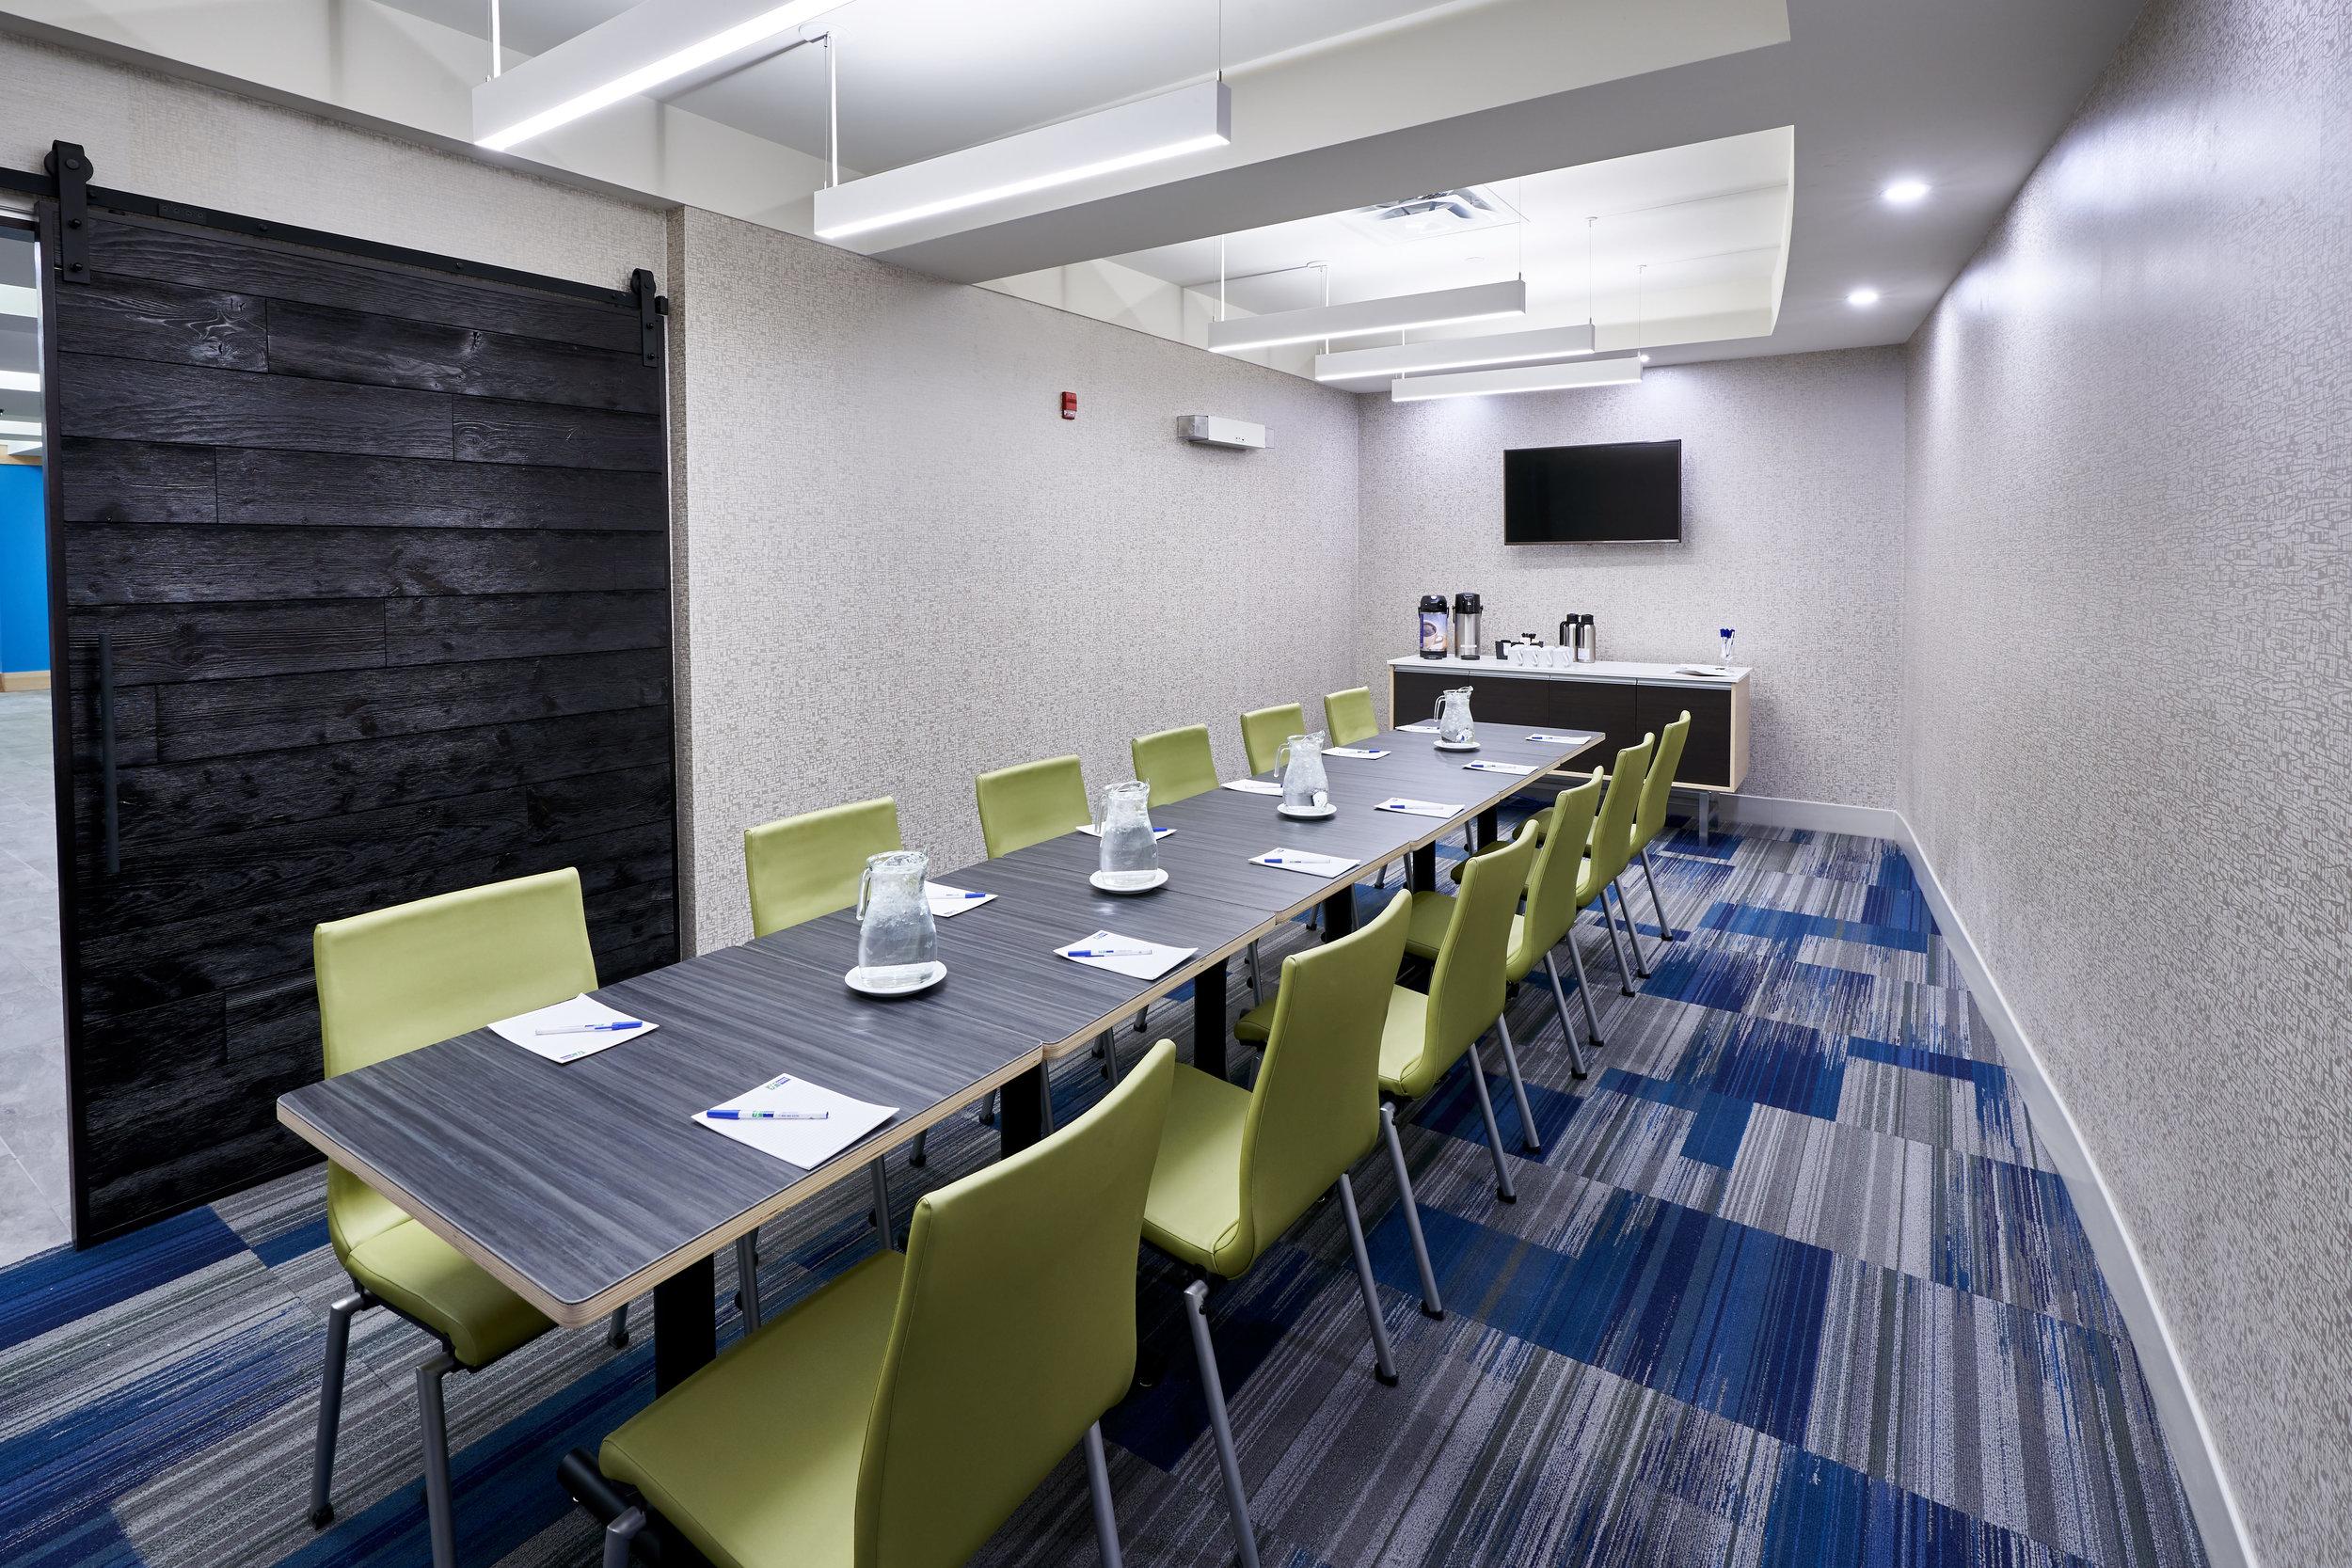 Holiday Inn Express - Meeting Room 2.jpg